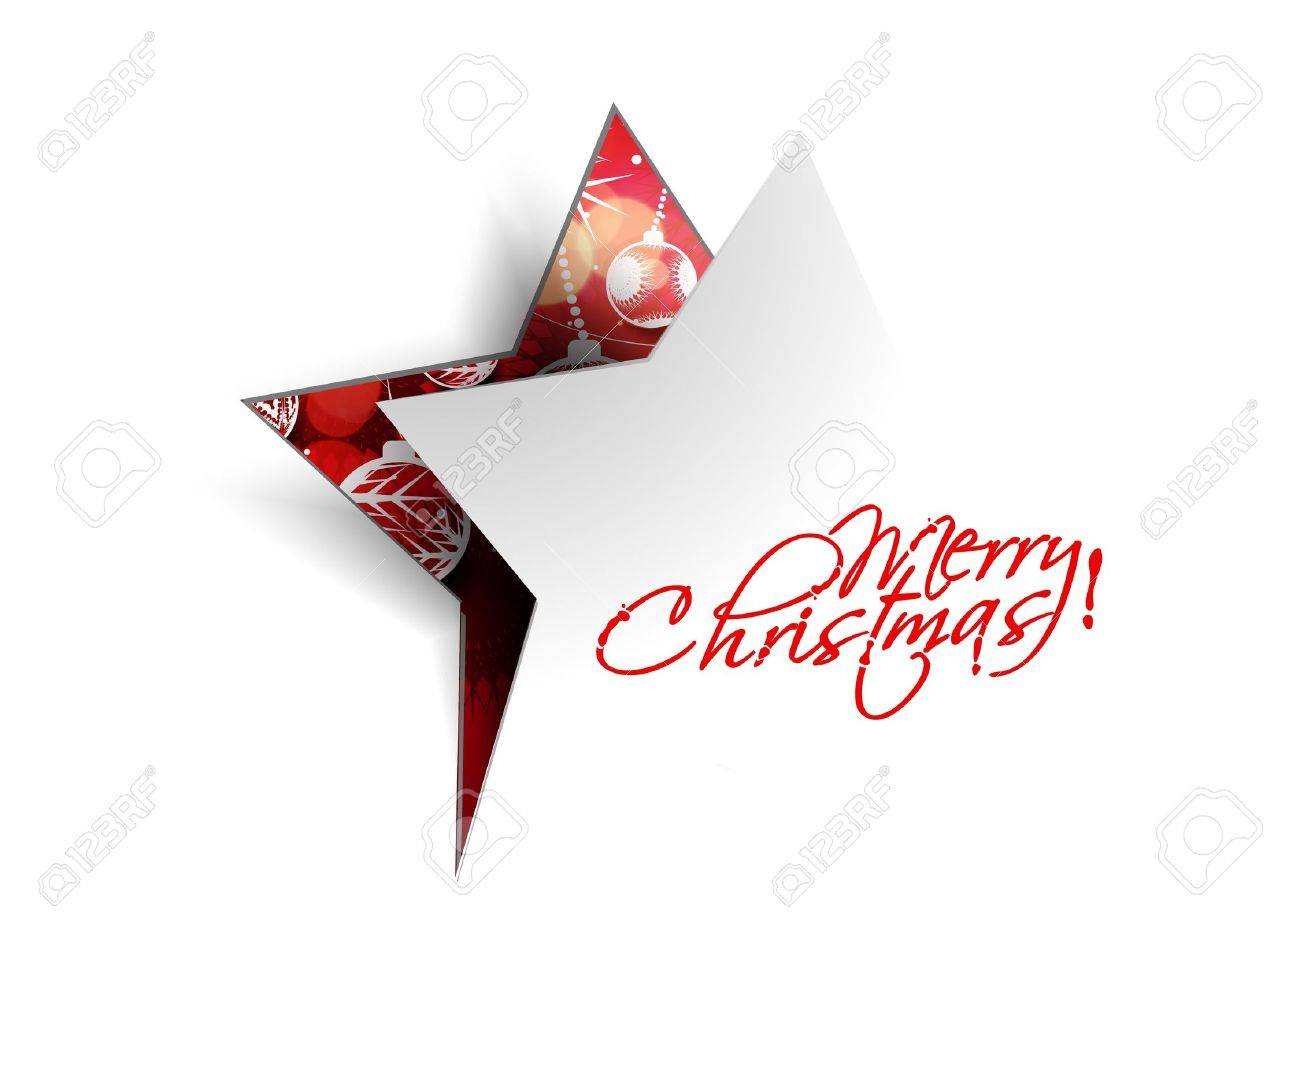 Modern christmas tree background illustration Stock Vector - 16818846